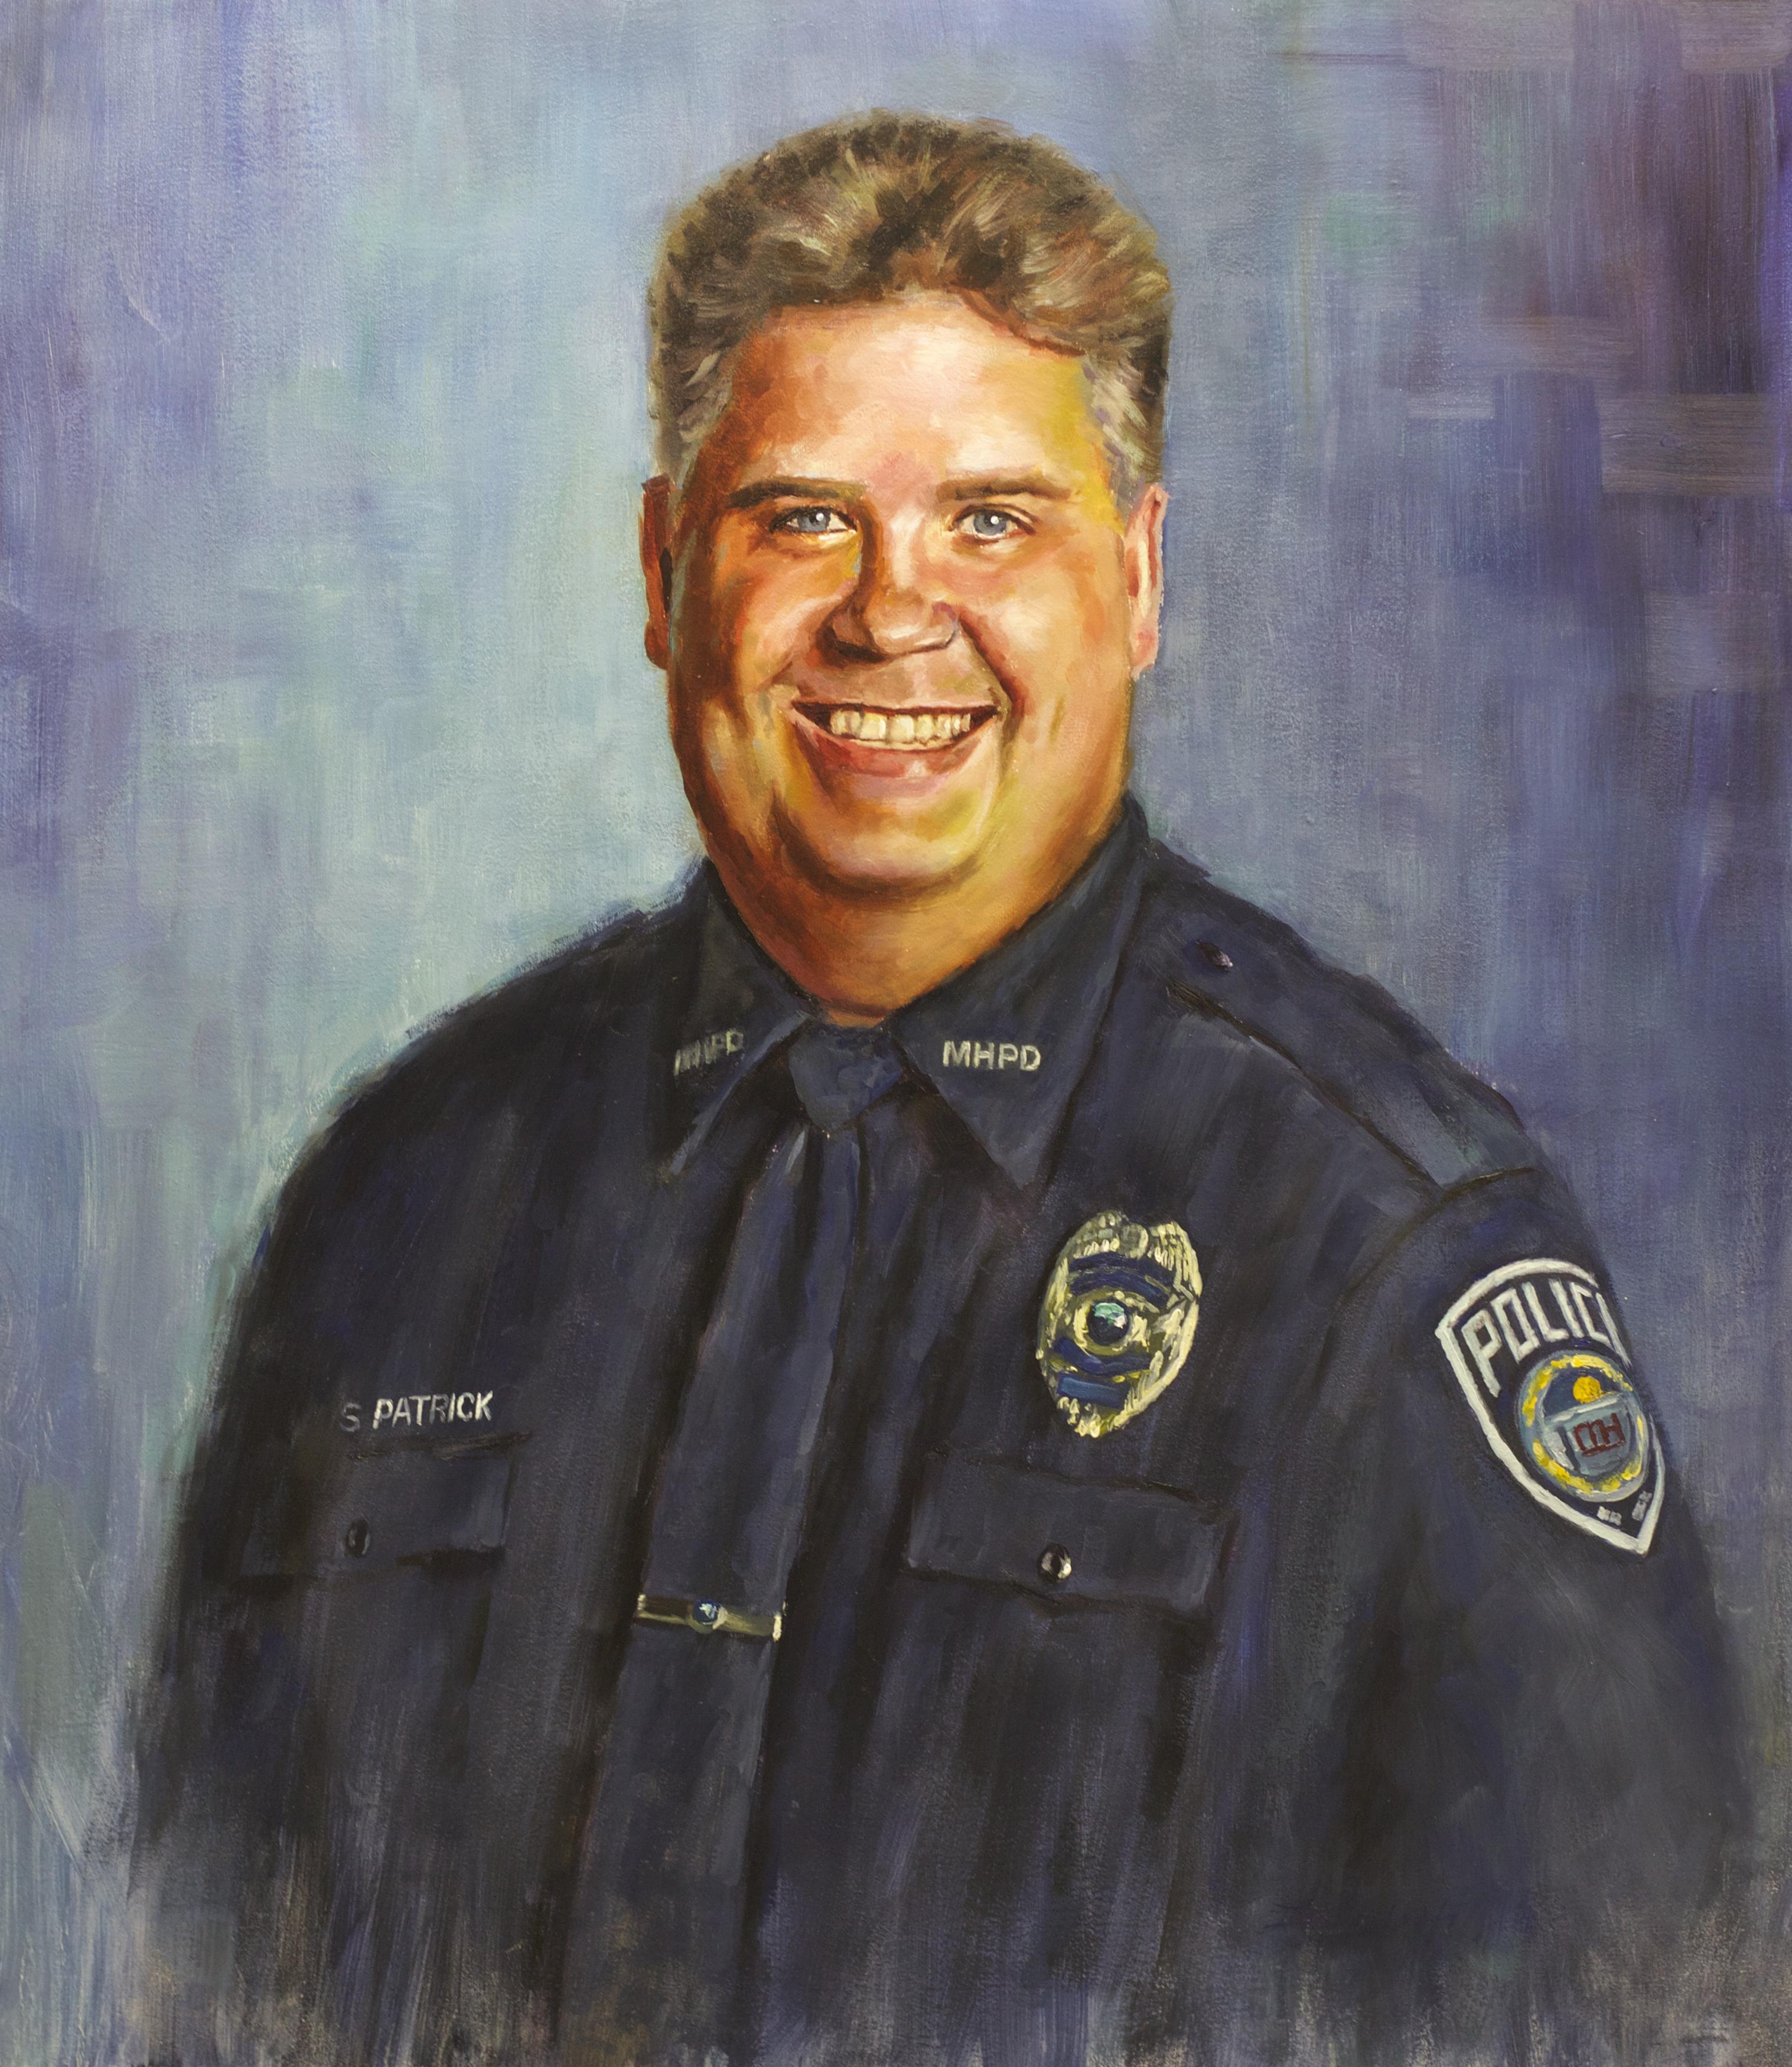 Officer Scott Patrick